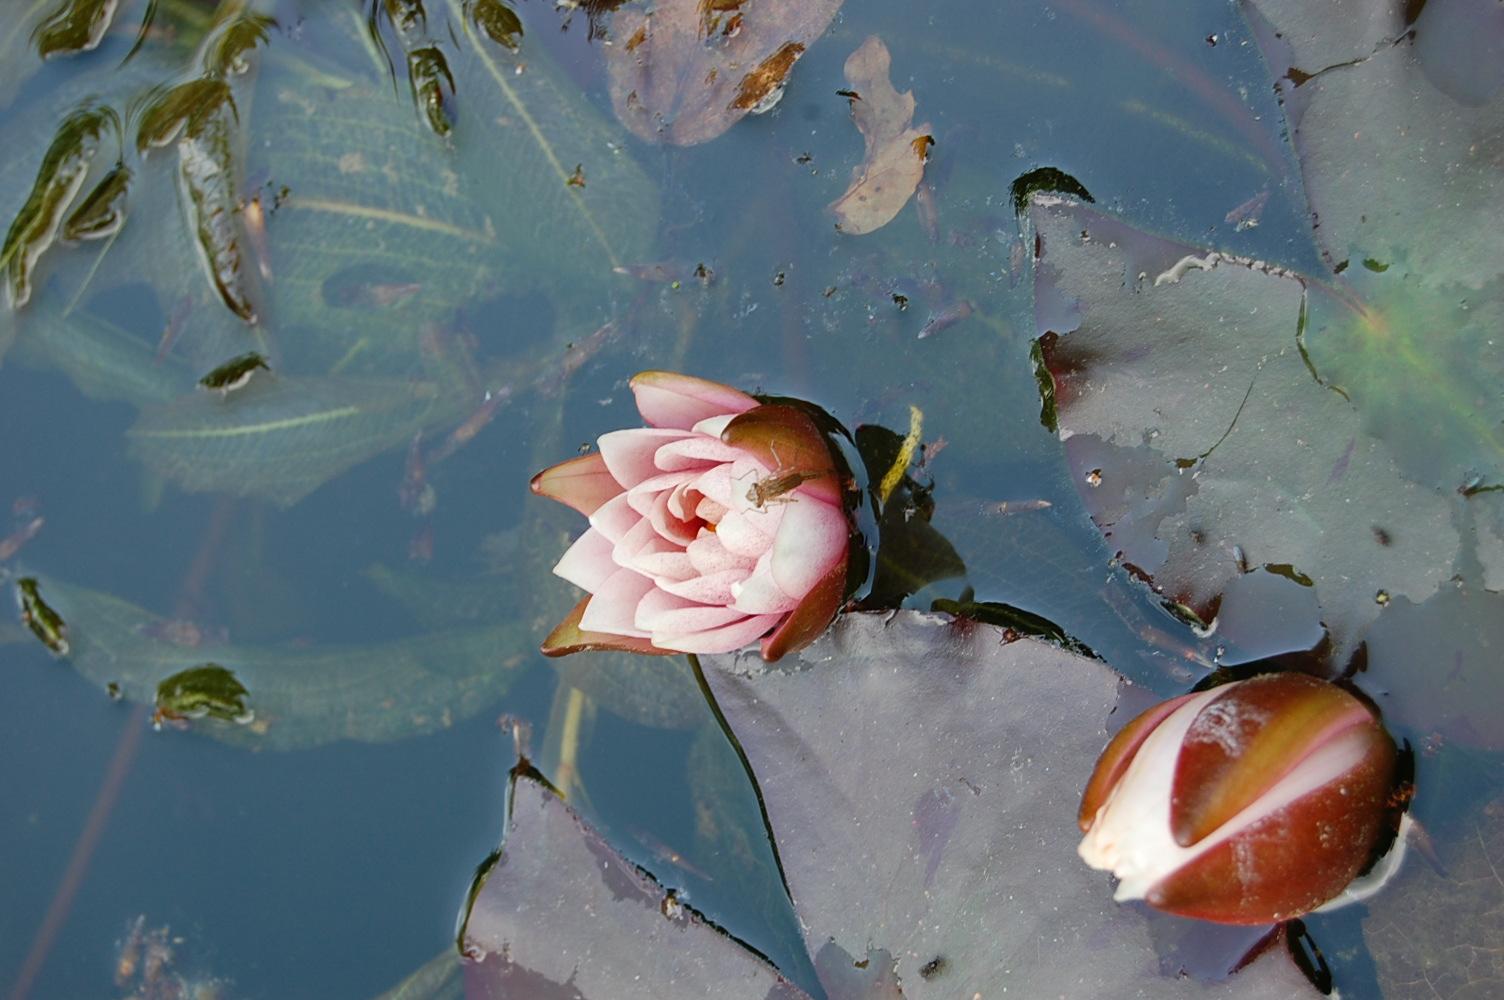 Patsy kay kolesar design no mud no lotus necklace artist residency lotus flower holland artist residency izmirmasajfo Image collections